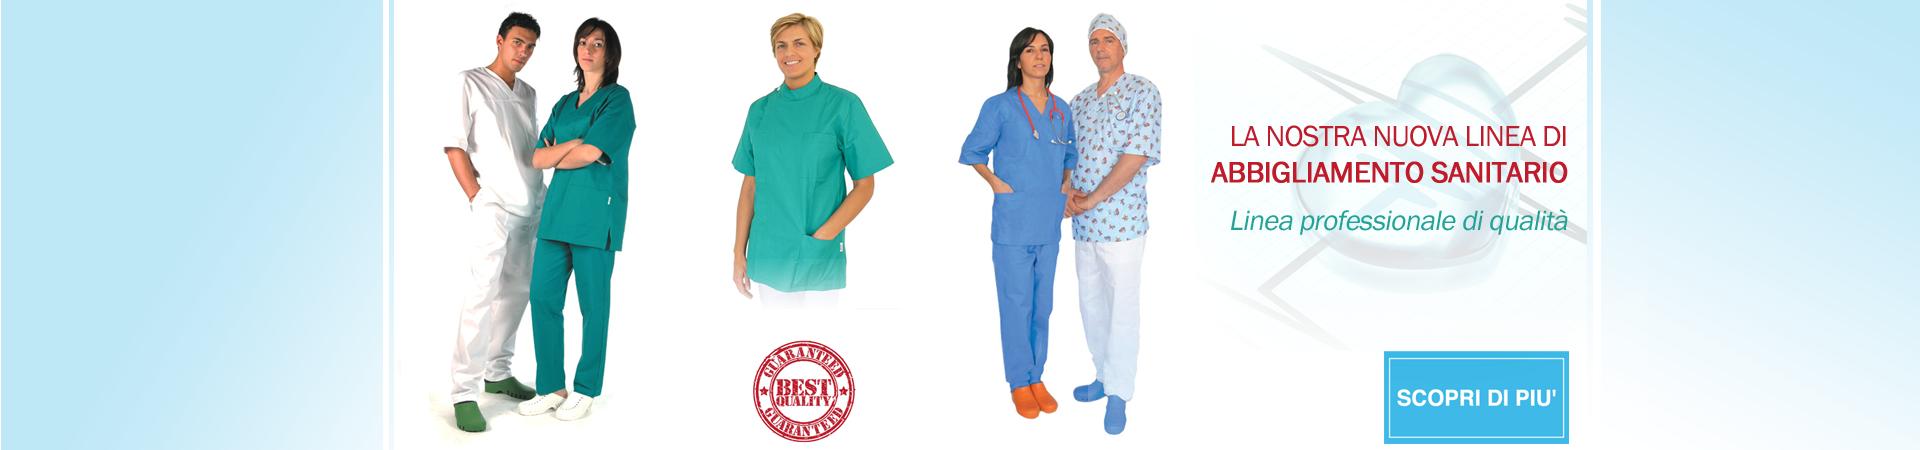 Abbigliamento sanitario medico